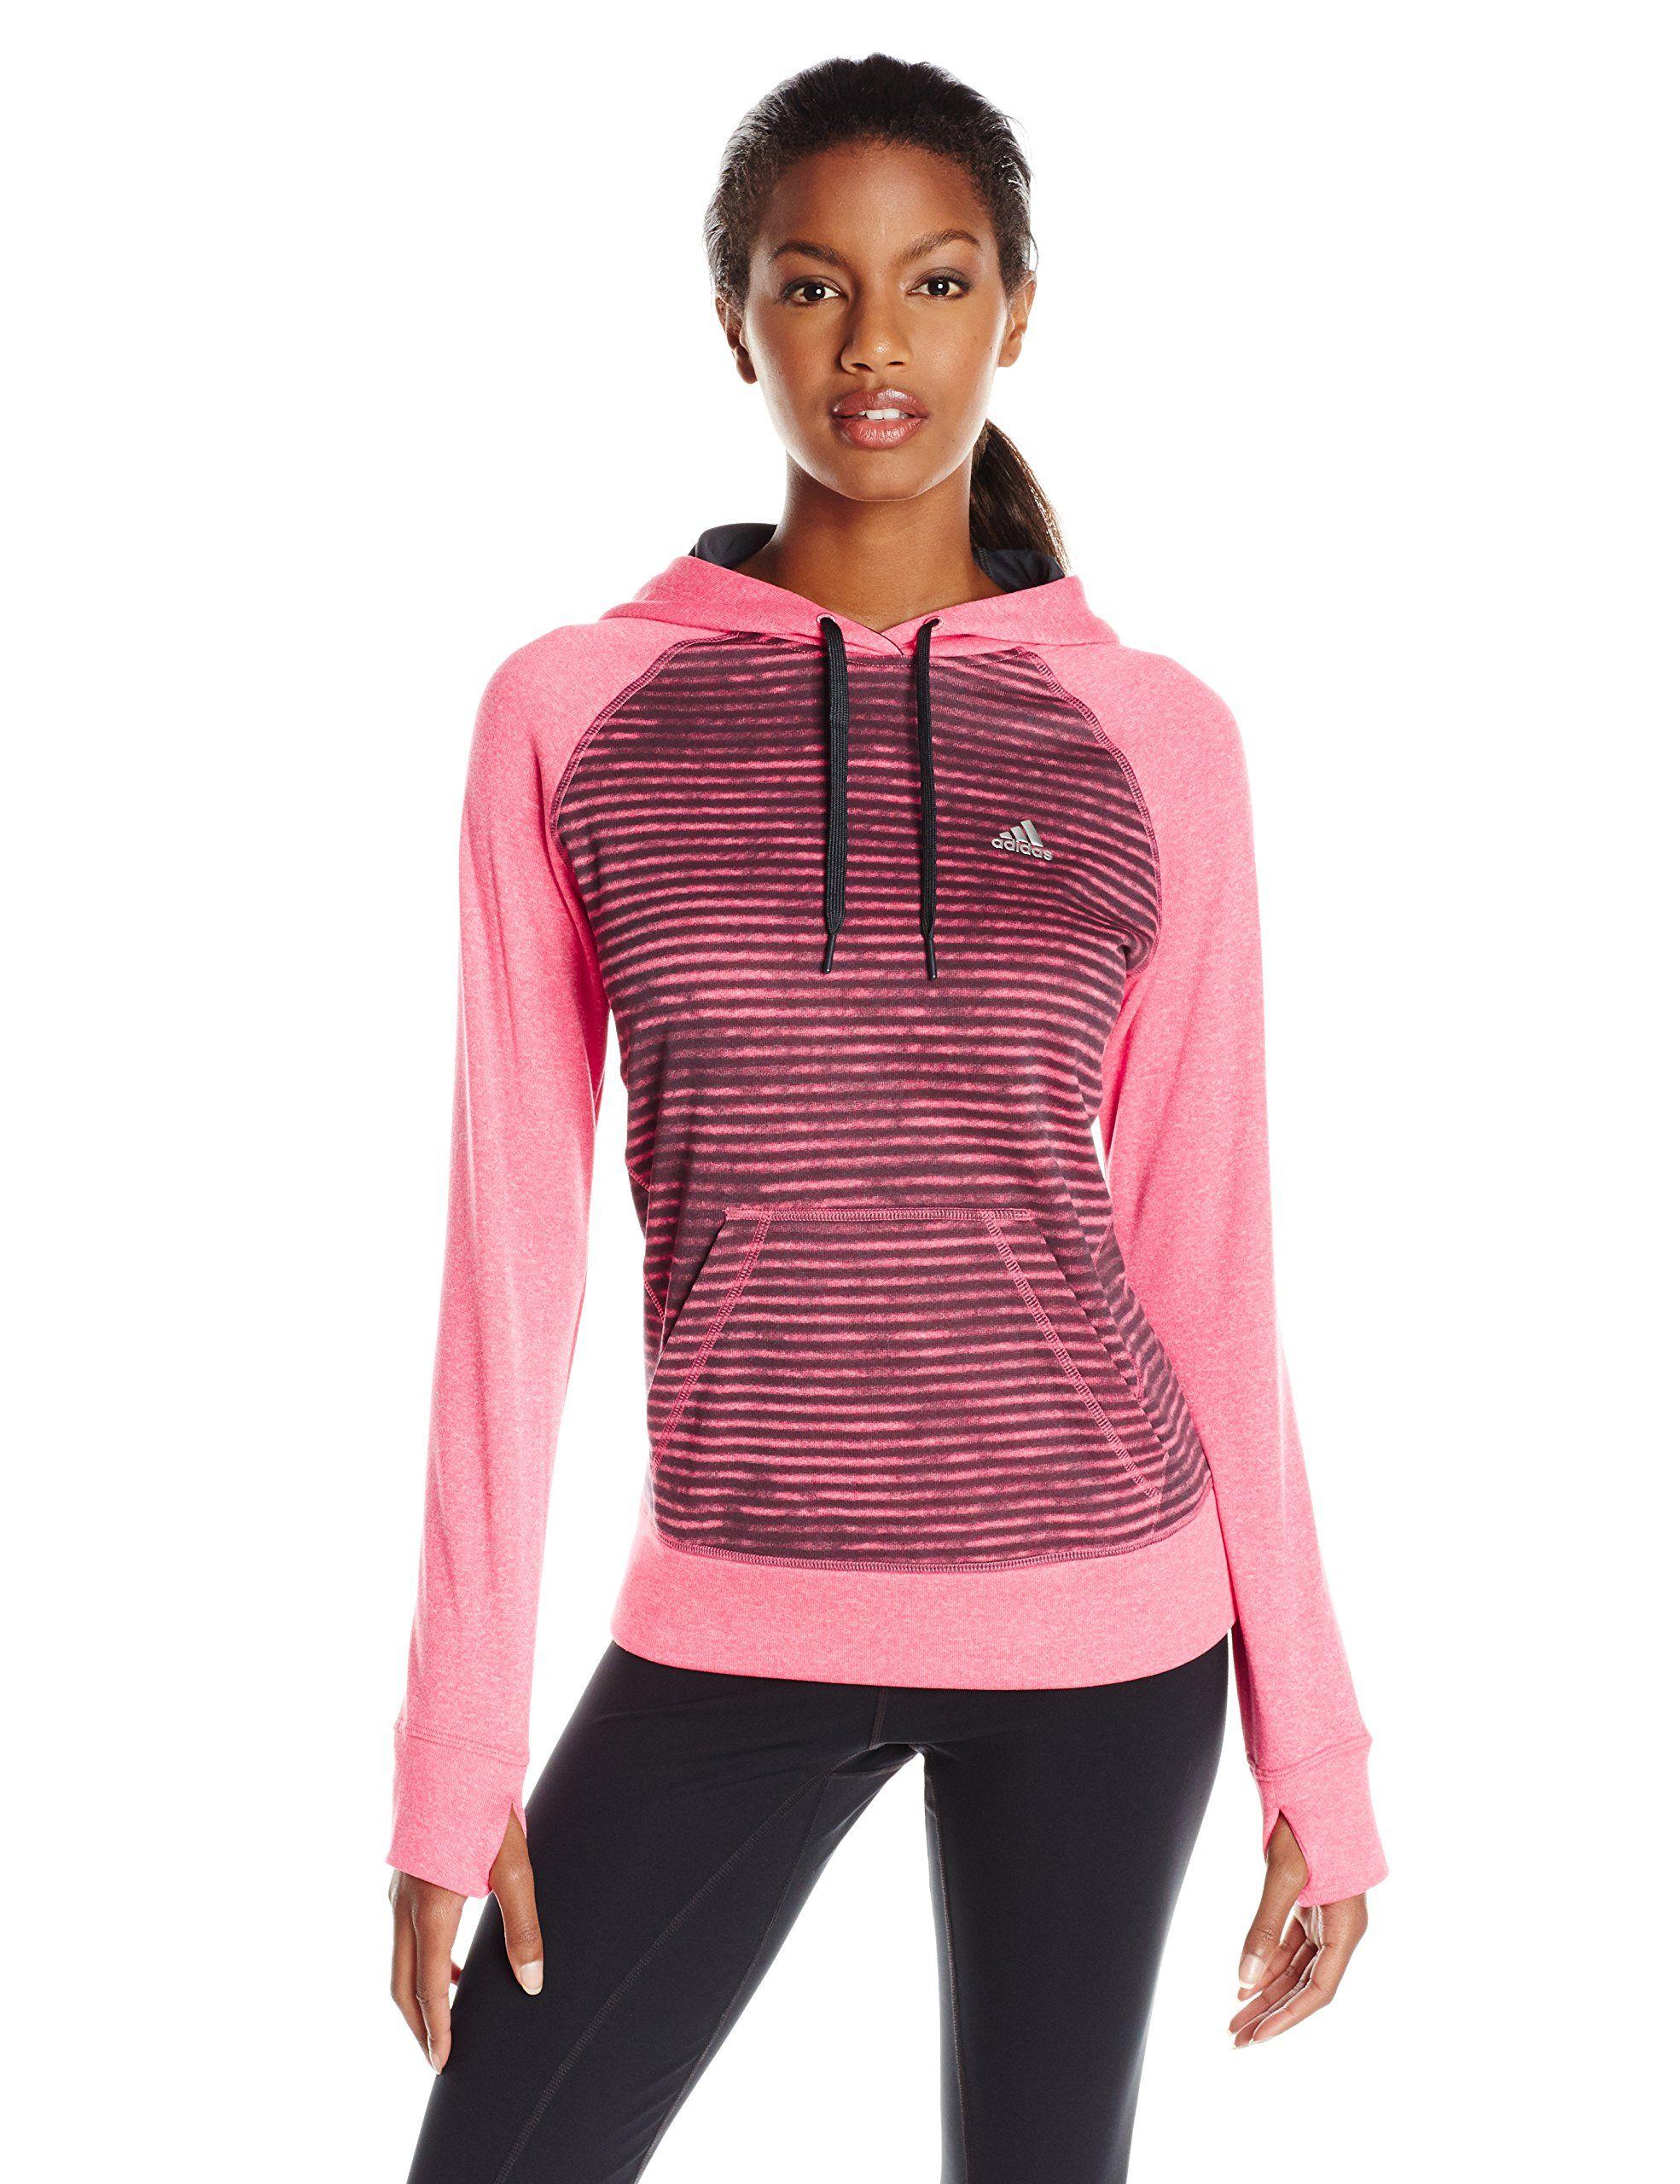 24b106b4e2c8 adidas Performance Women s Ultimate Striped Hoodie